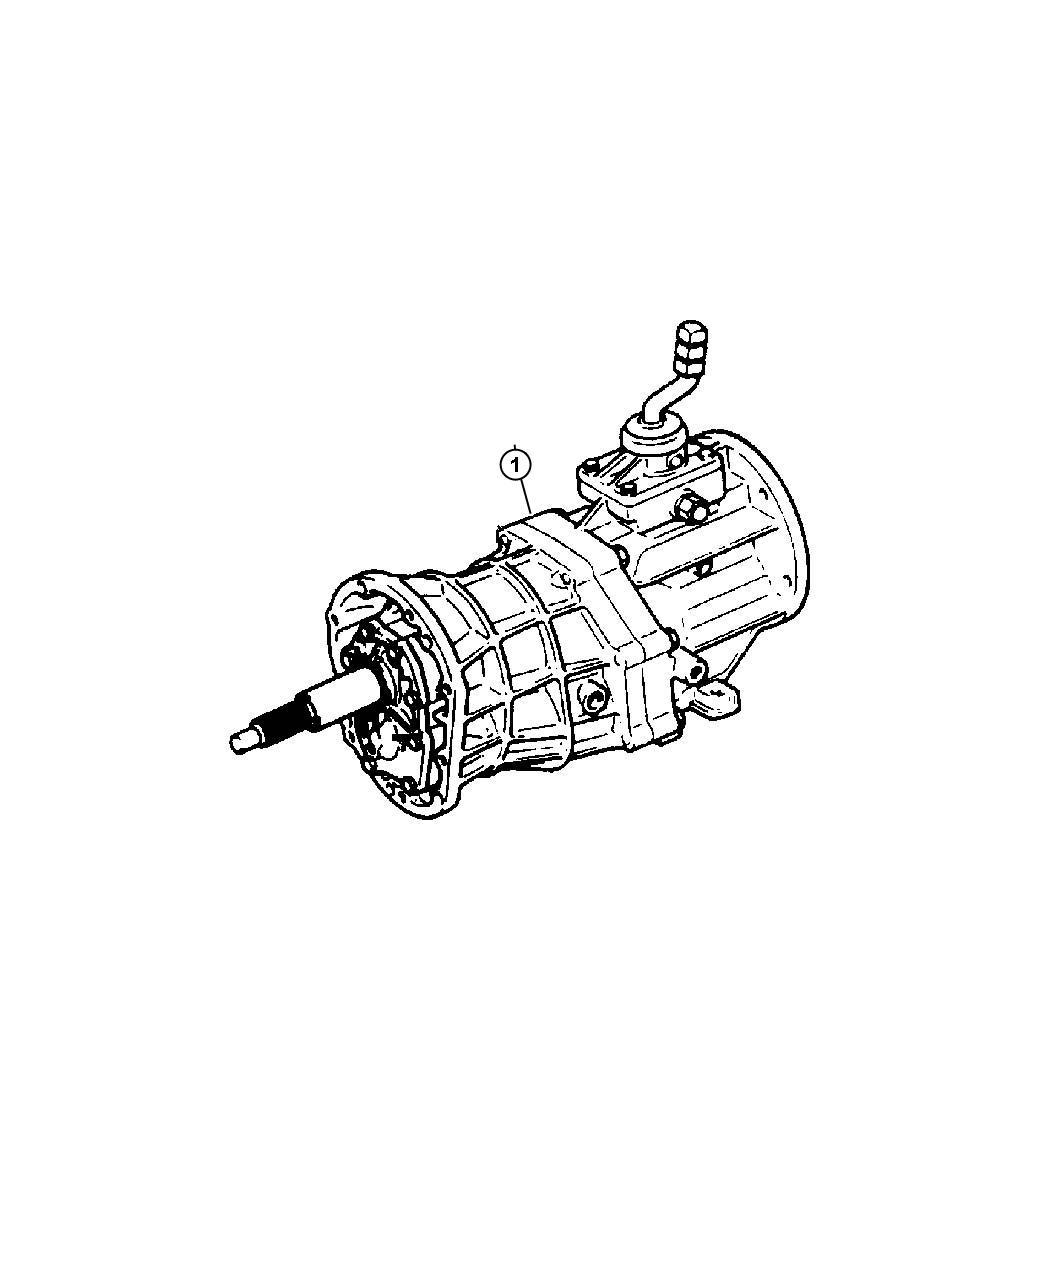 Jeep Liberty Transmission 5 Speed